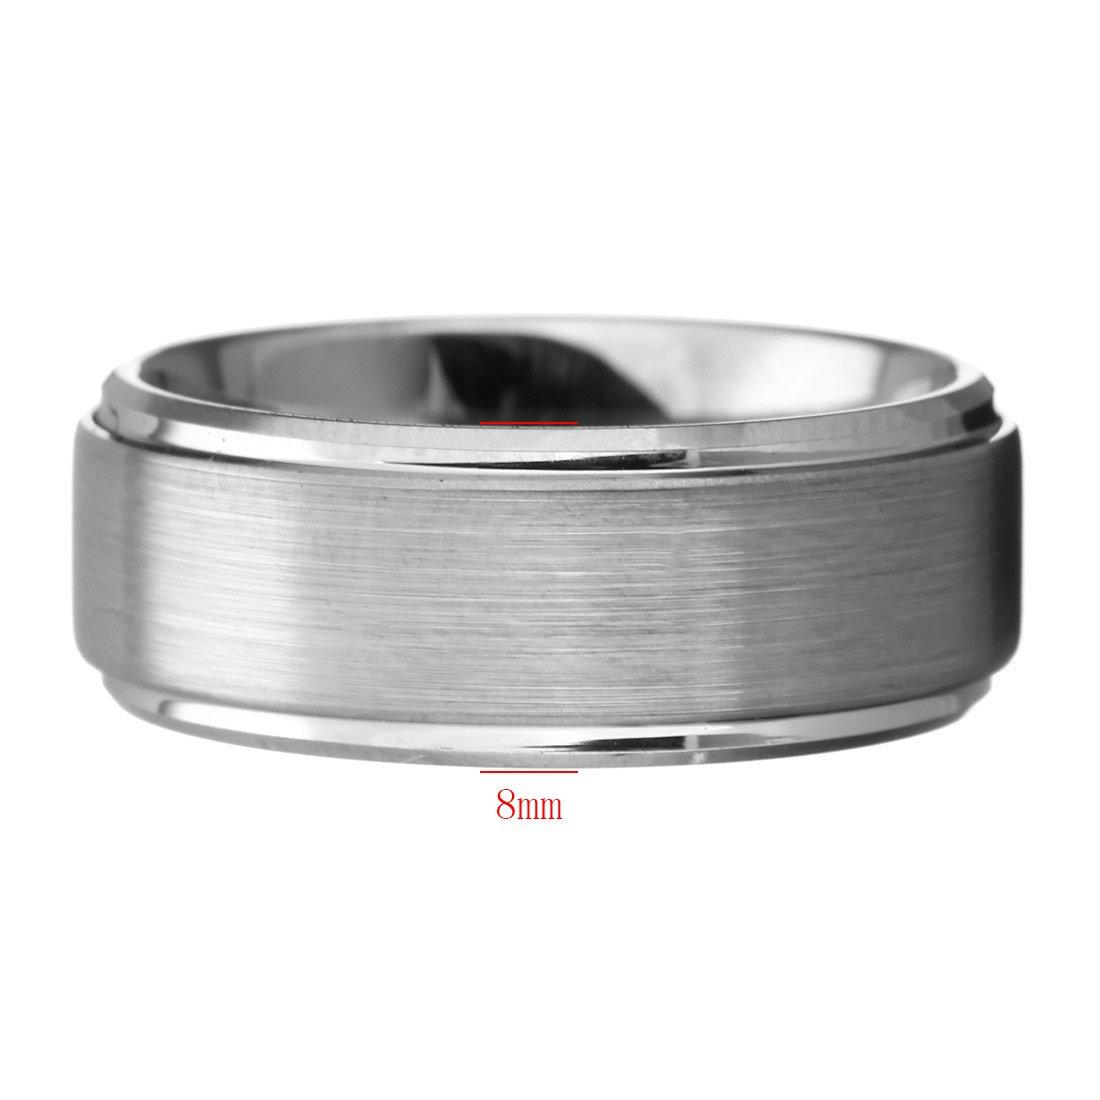 Para hombre anillo de tungsteno, carburo de tungsteno de boda banda anillo 8 mm: Amazon.es: Joyería